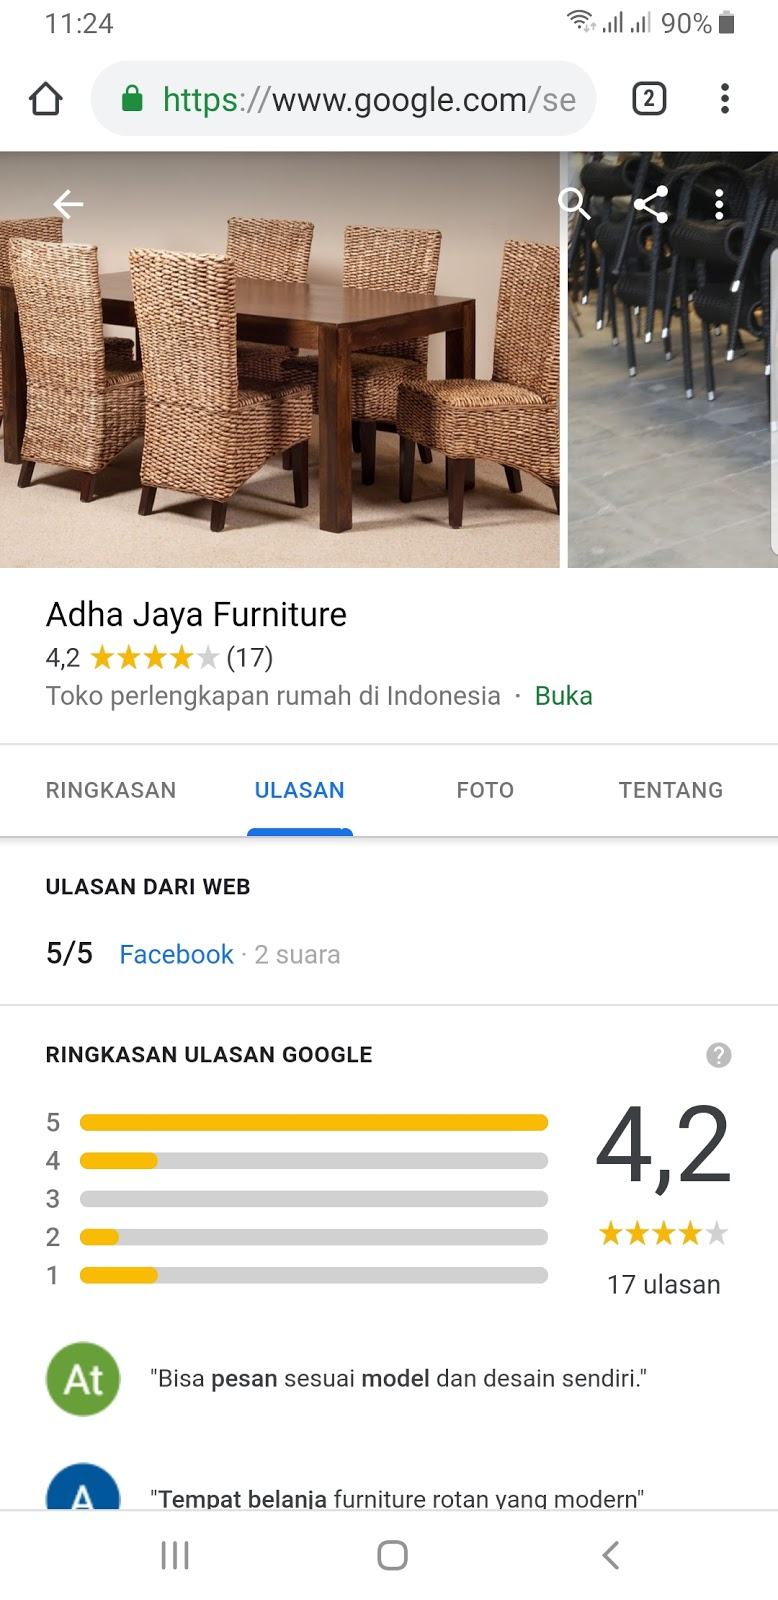 Hati Hati Dengan Adha Jaya Furniture Cirebon